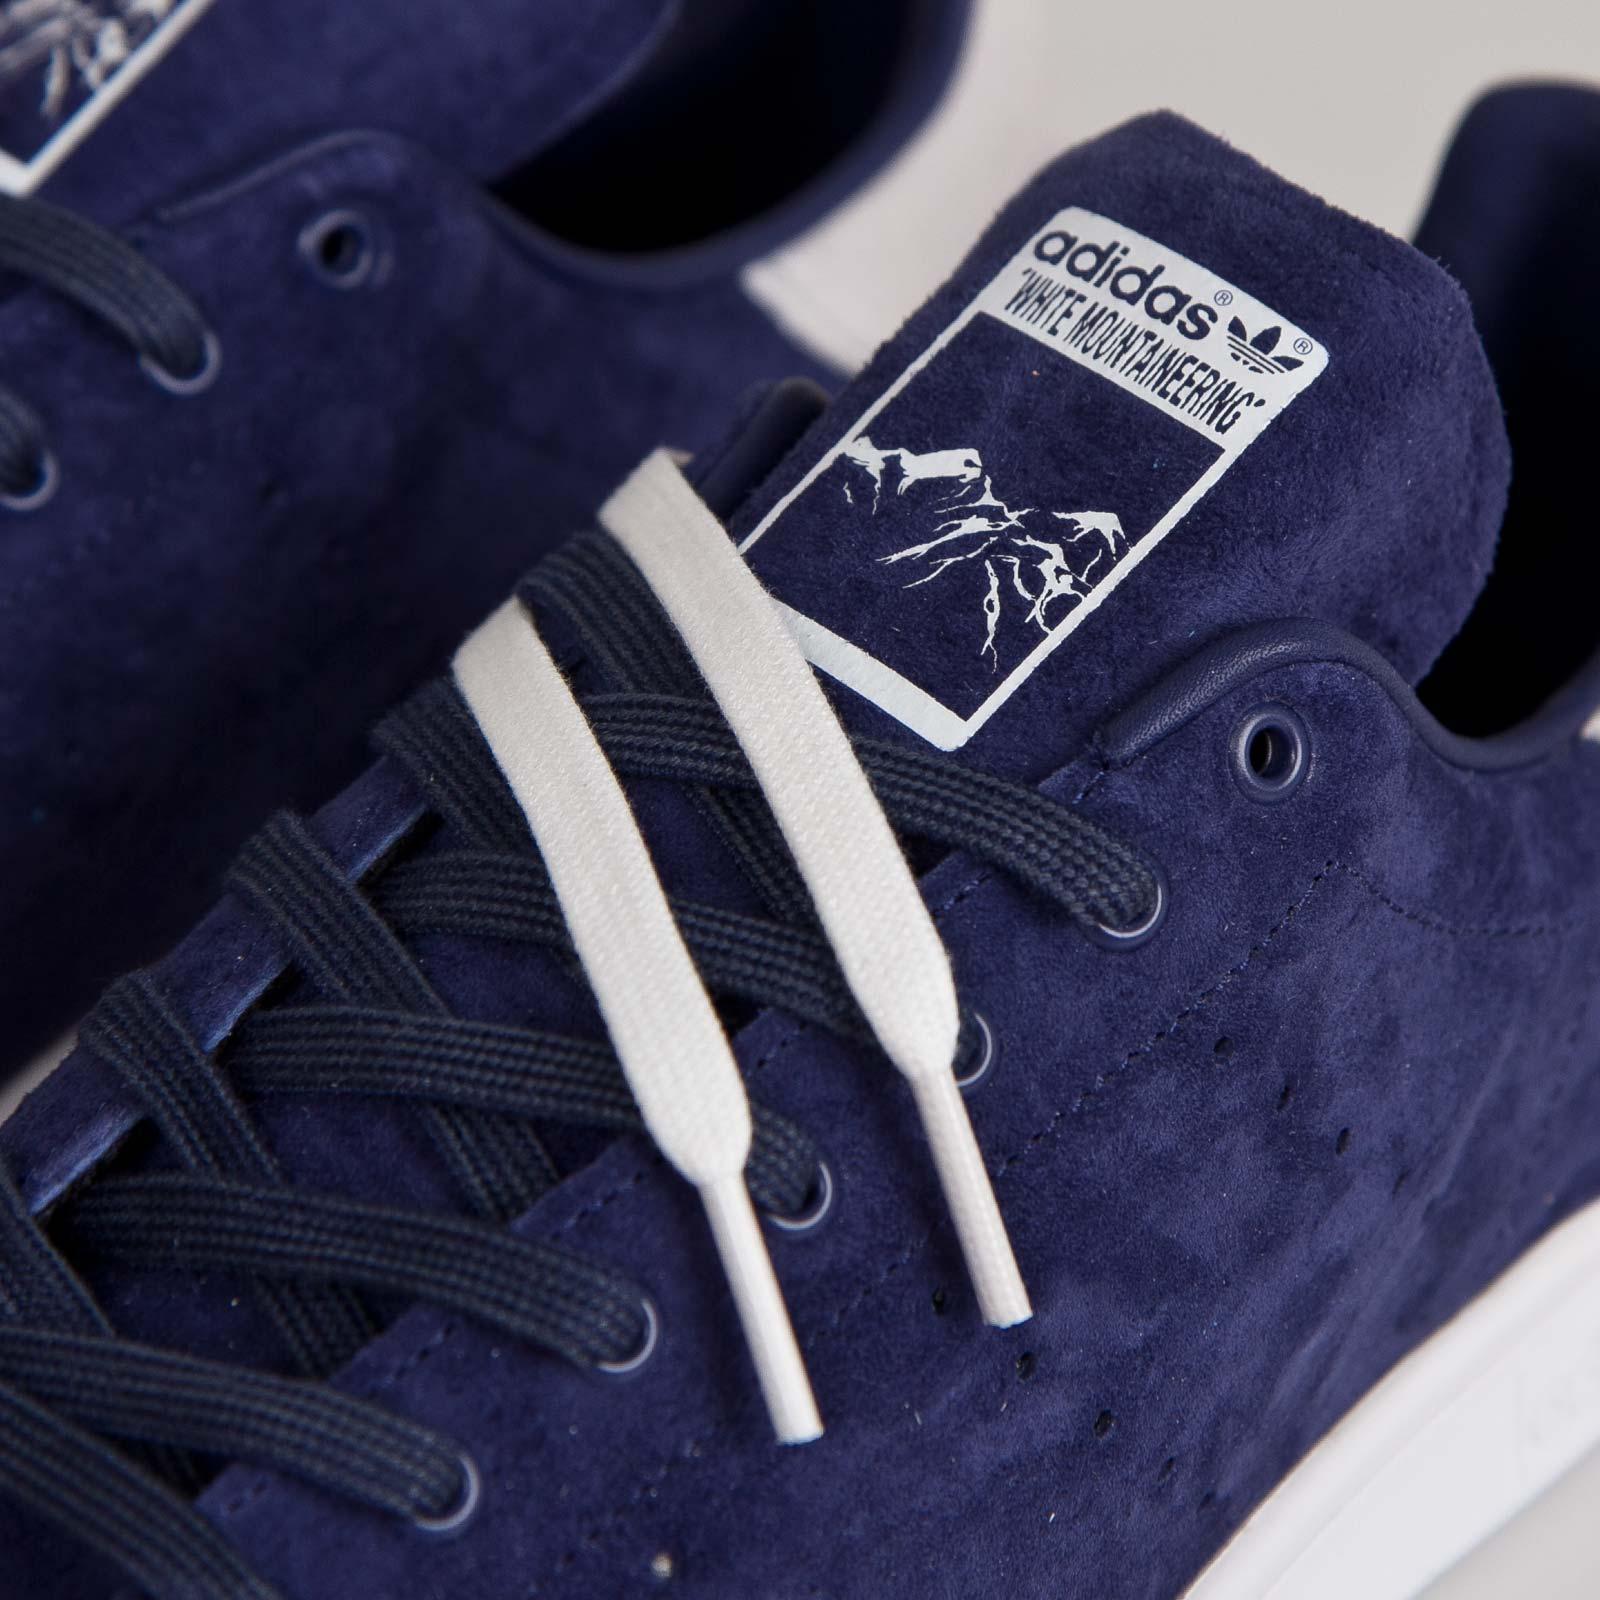 20c5e9ab66d49d adidas Stan Smith White Mountaineering - B34151 - Sneakersnstuff ...